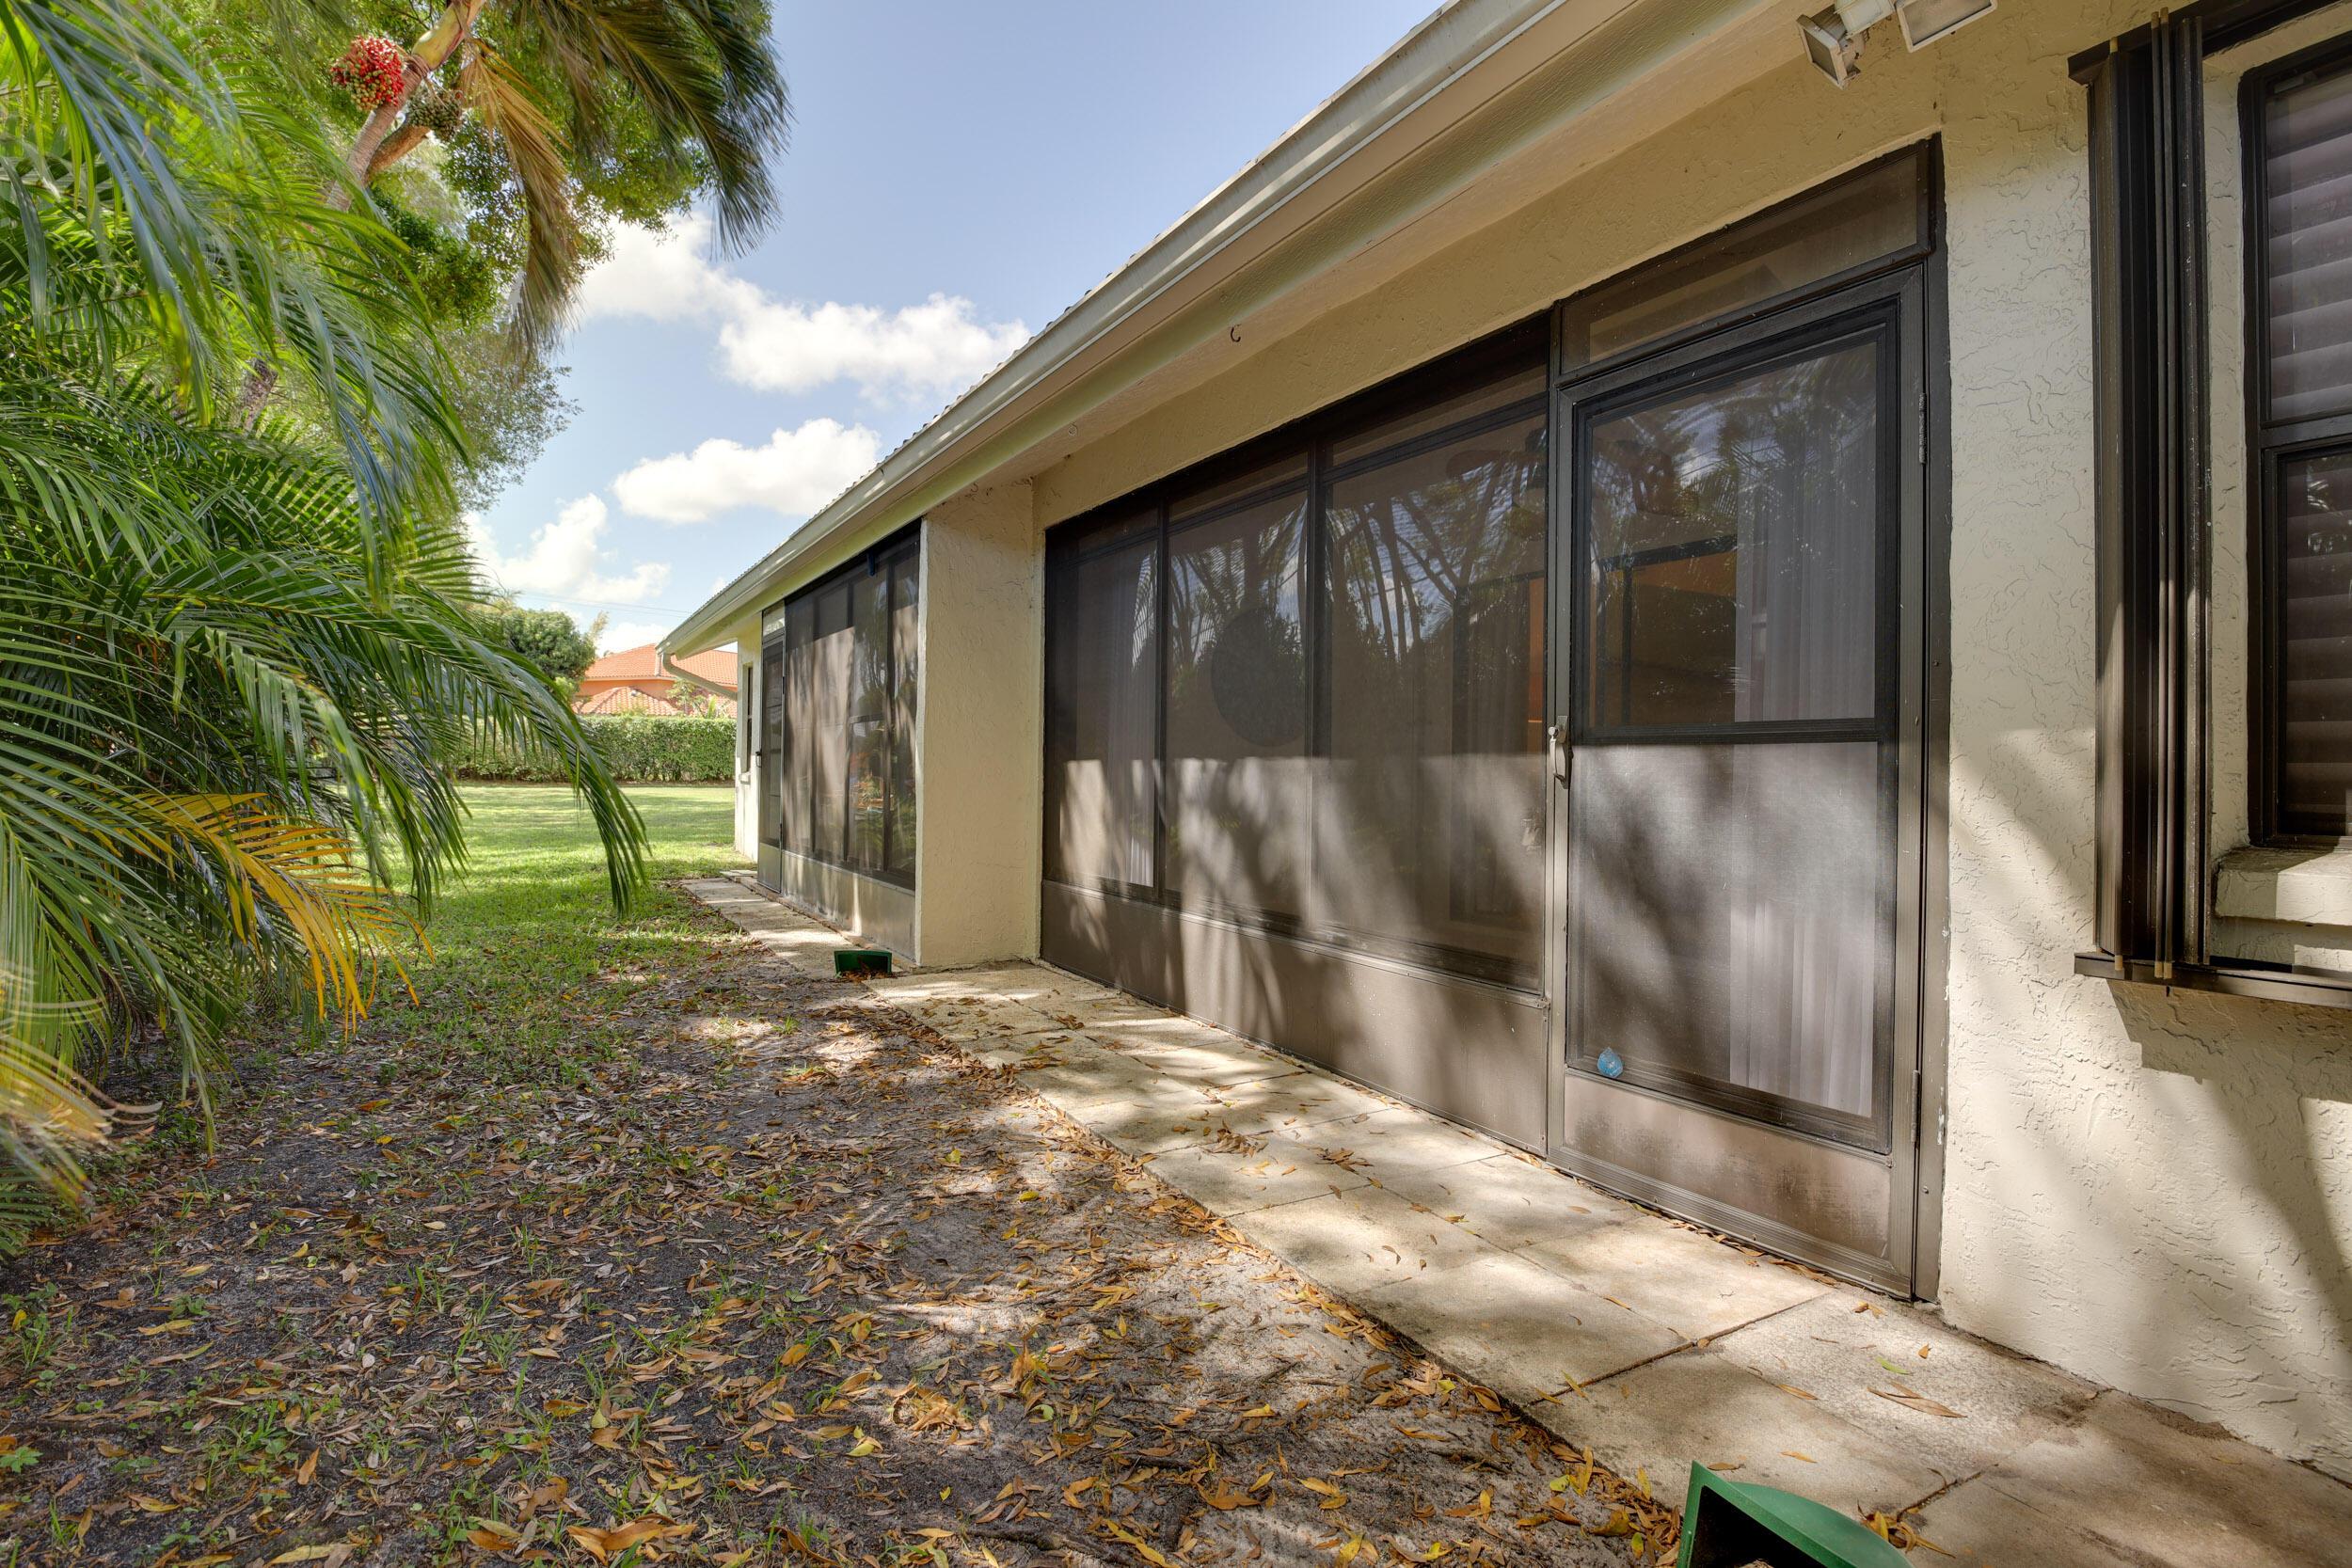 9879 Pavarotti Terrace 103 Boynton Beach, FL 33437 photo 31